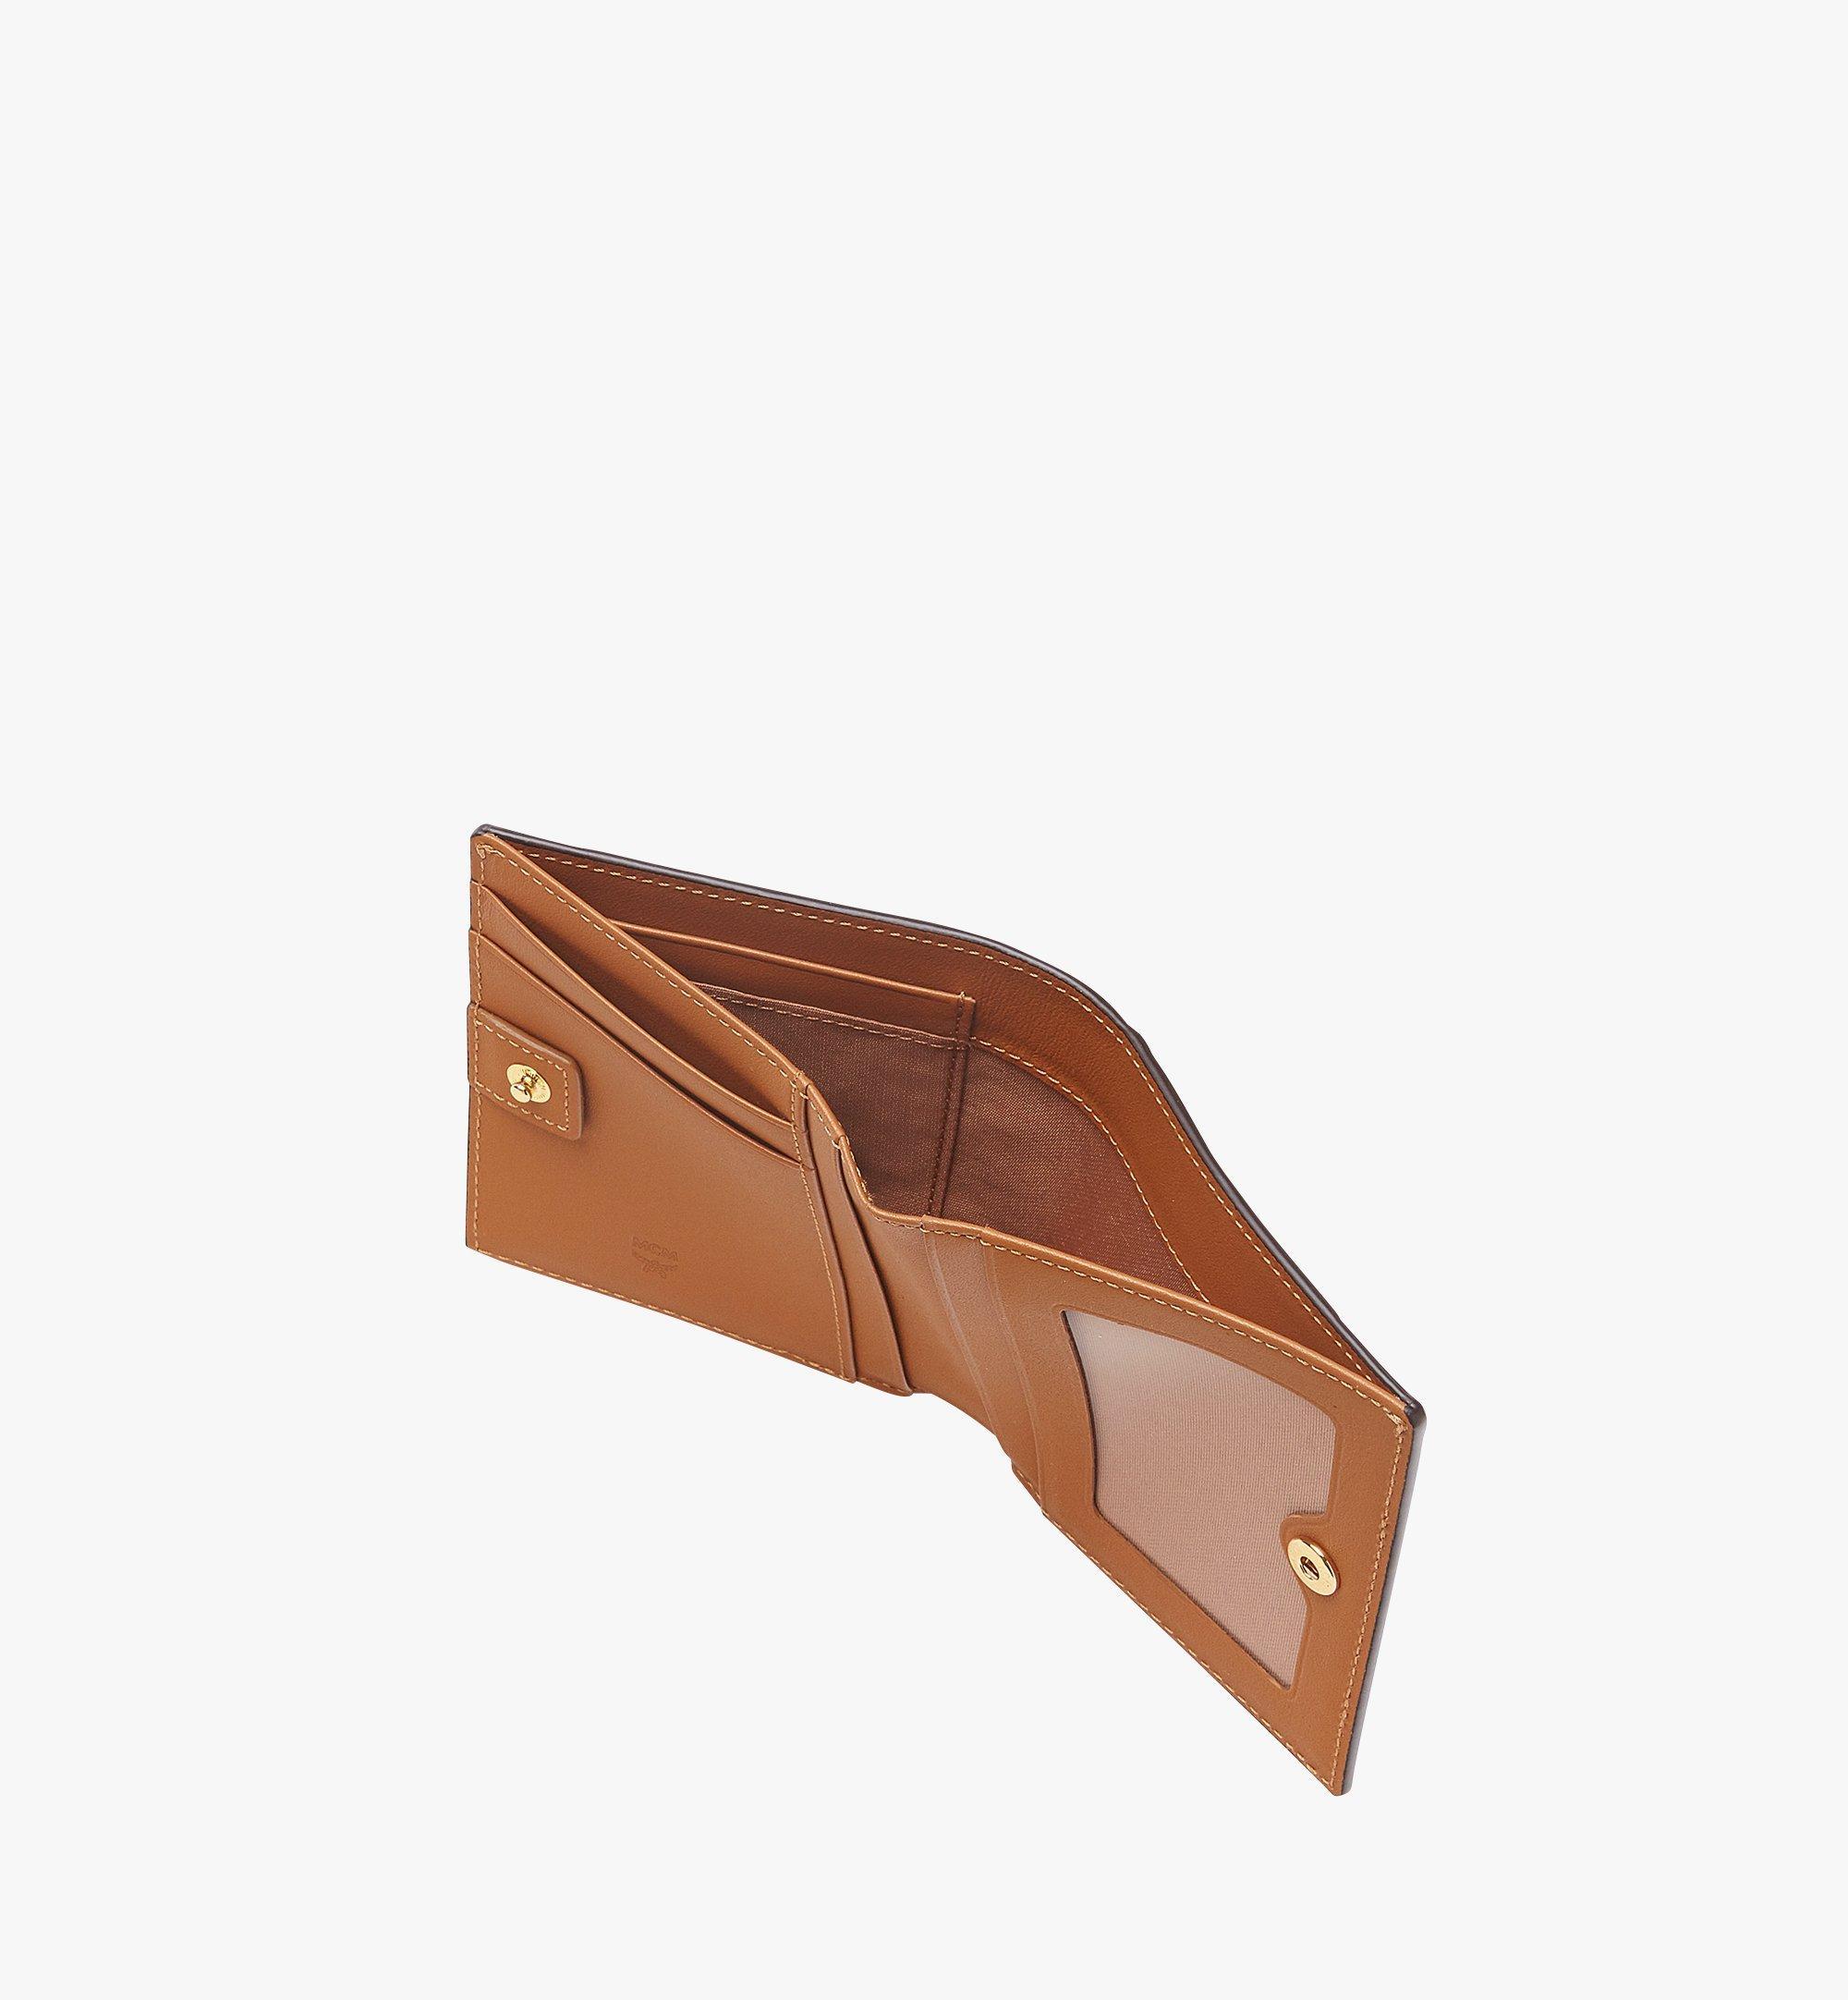 MCM Two Fold Wallet in Visetos Original Cognac MYS8SVI94CO001 Alternate View 4